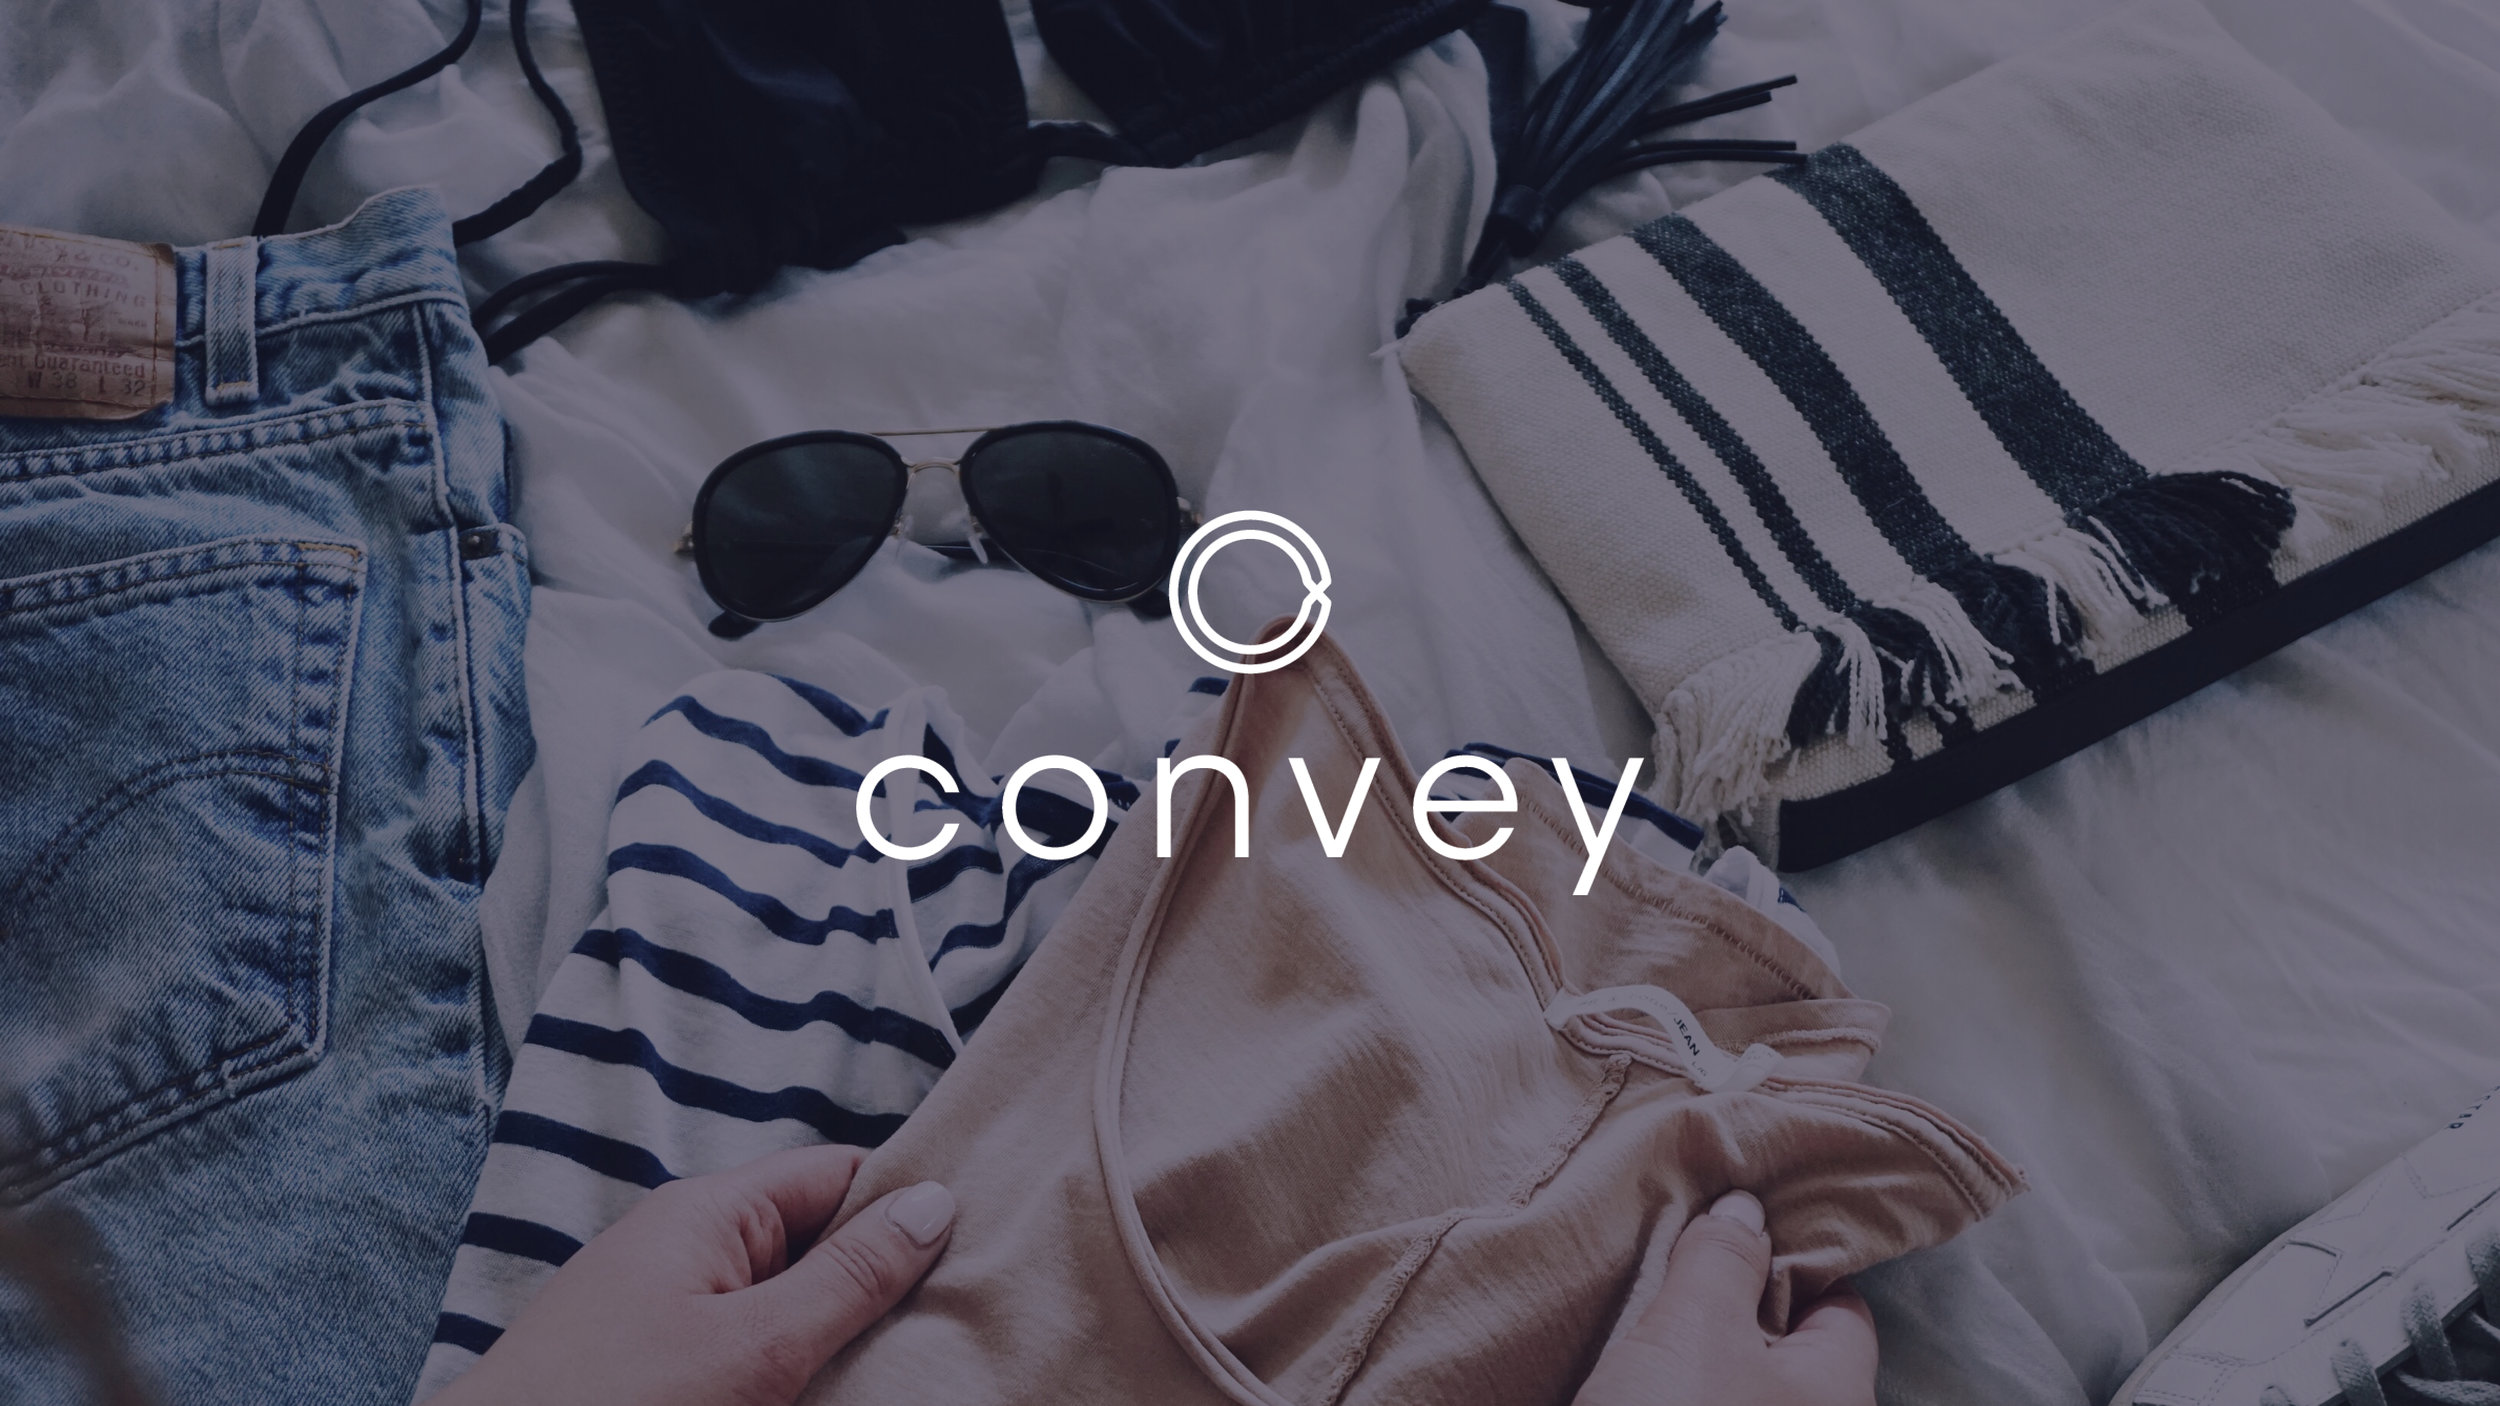 Convey1.jpg